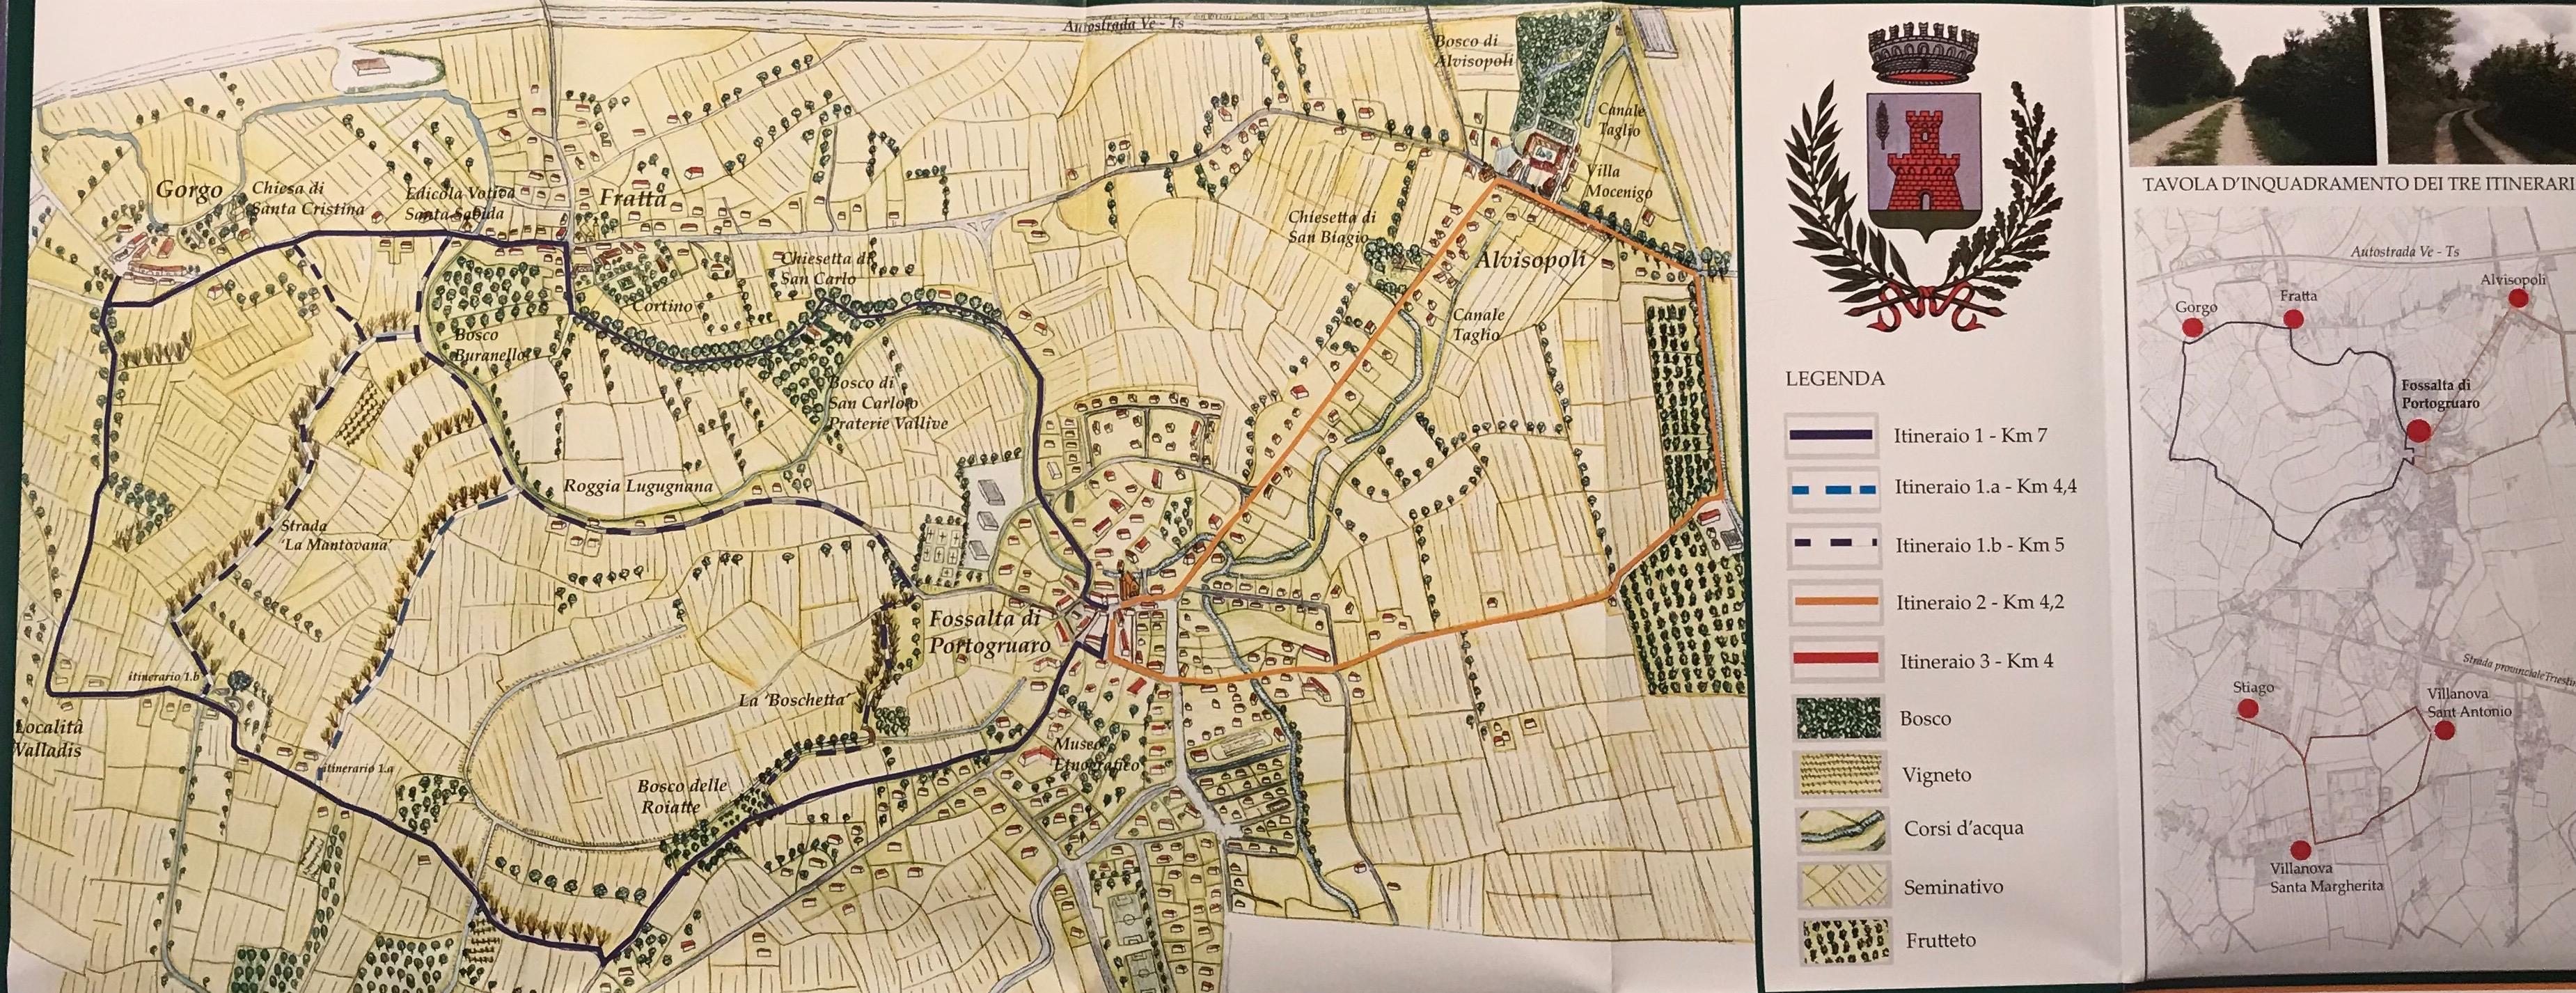 Fossalta di Portogruaro, itinerary